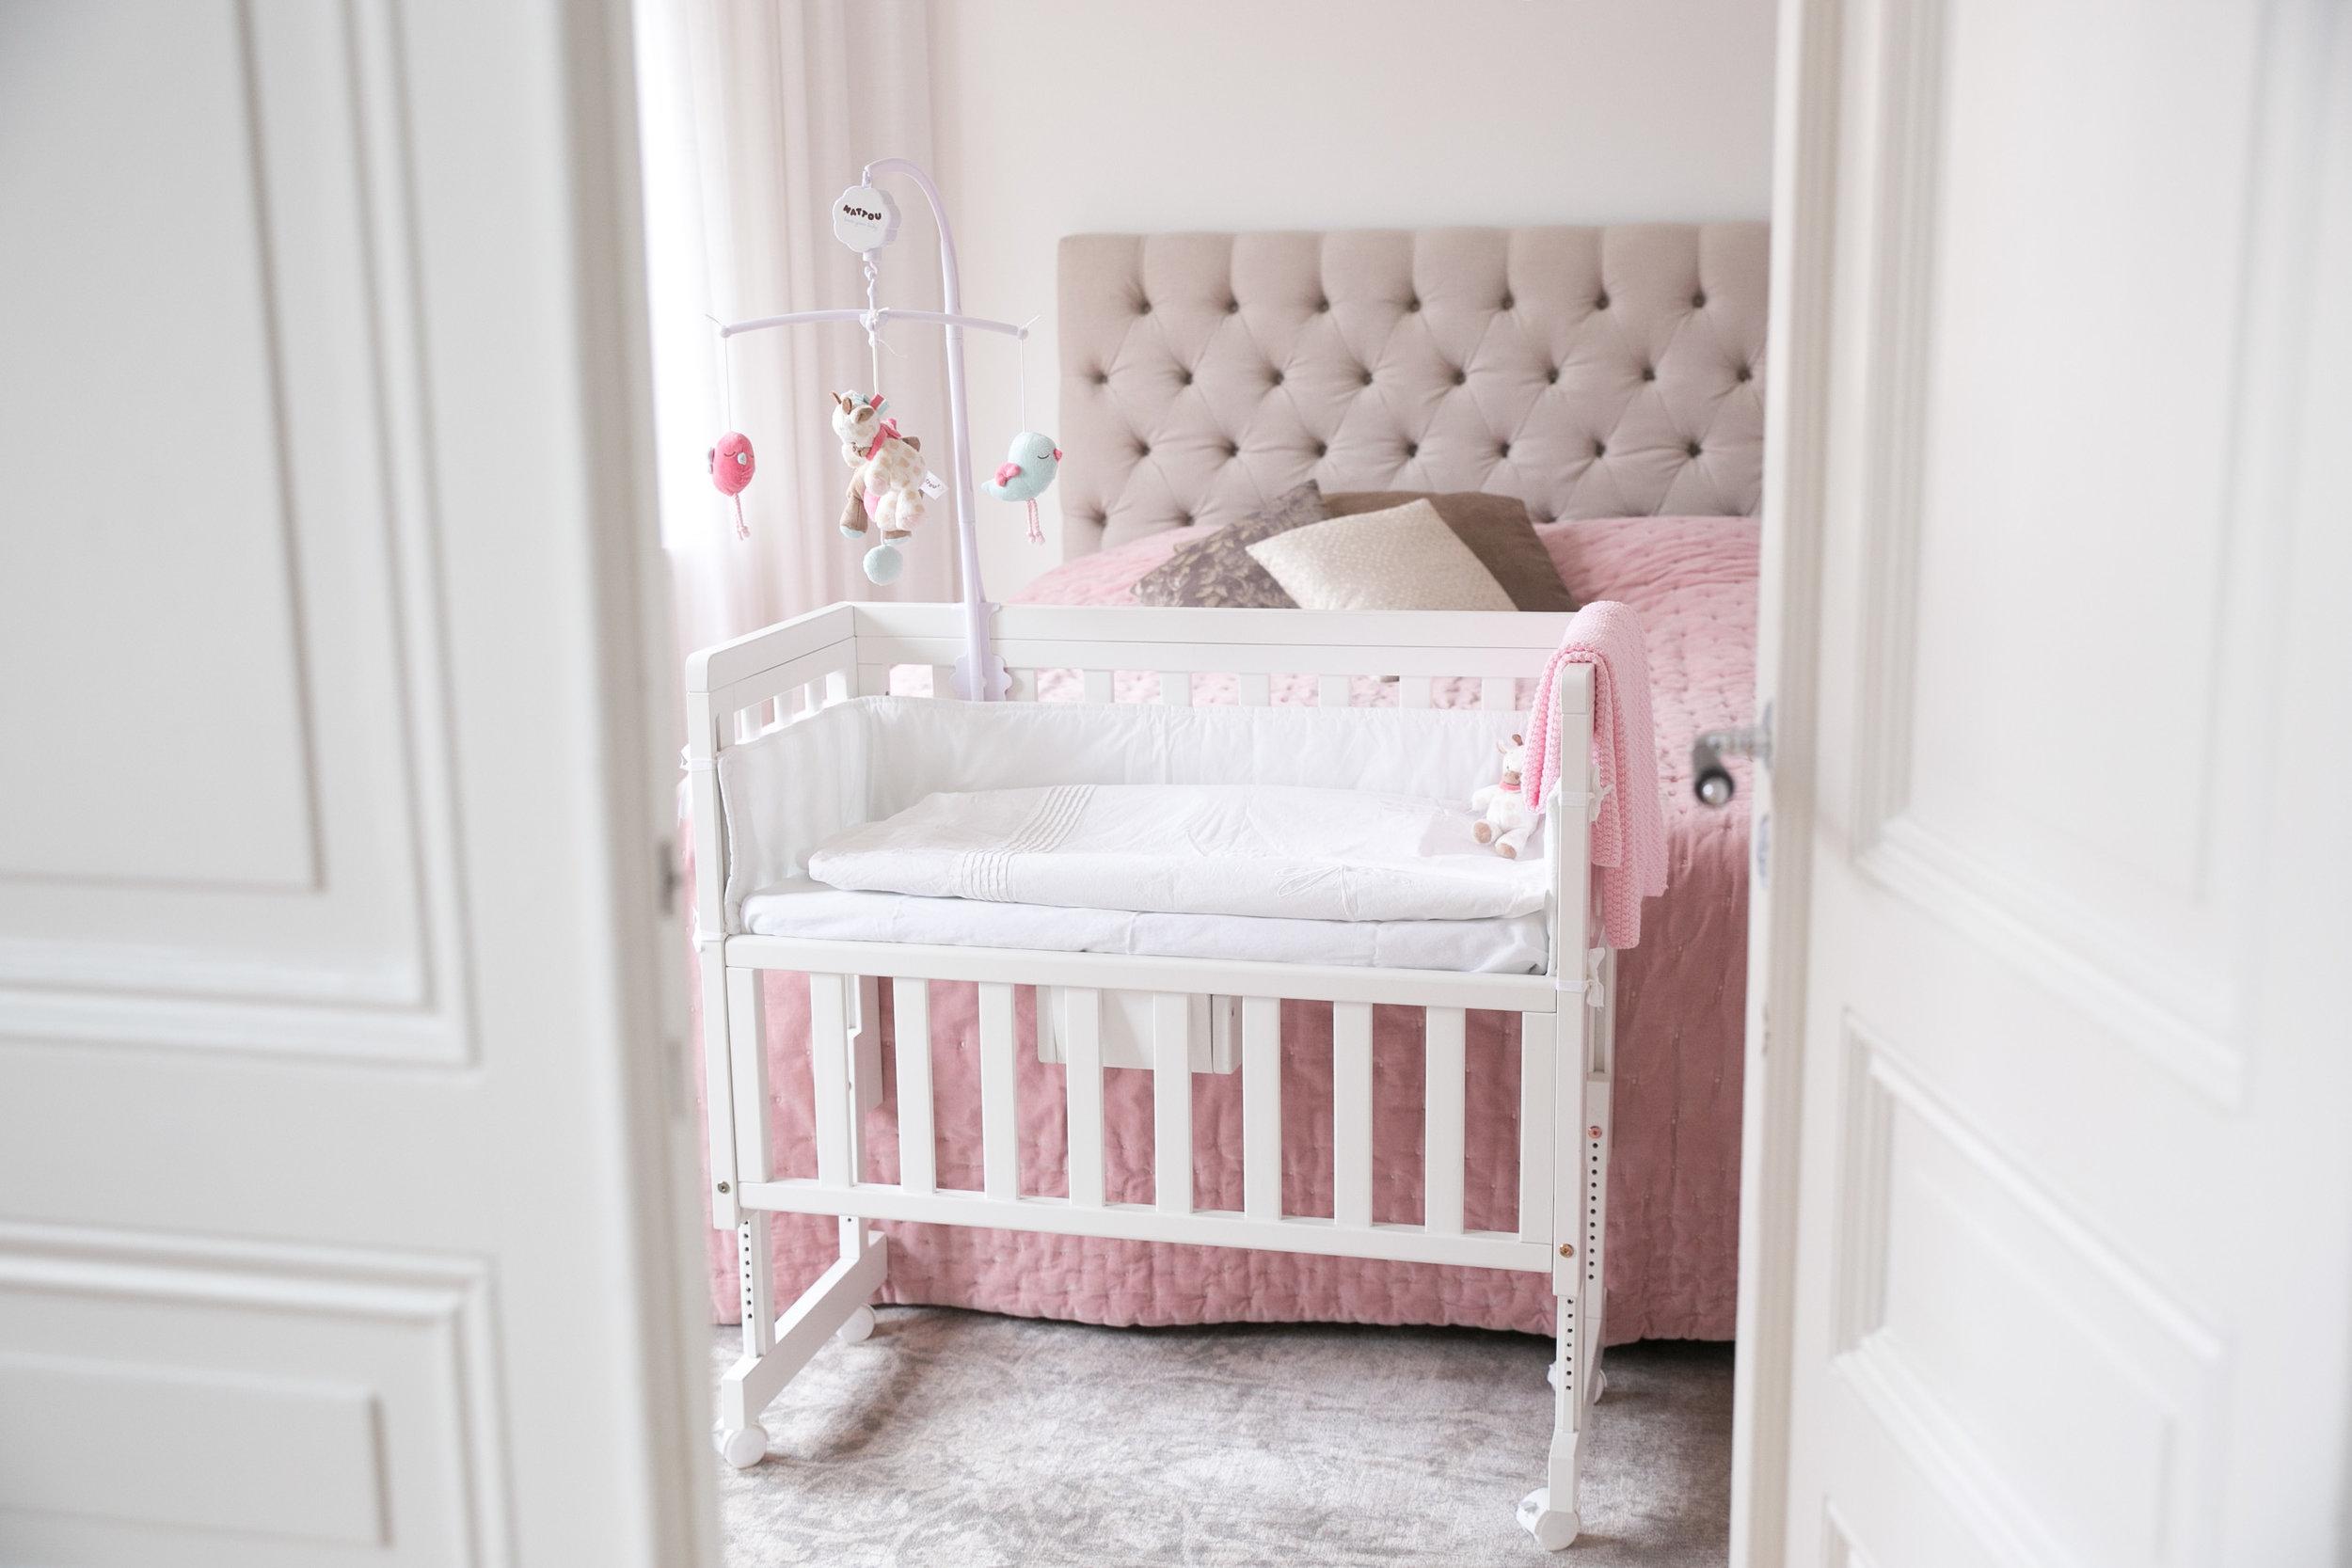 troll bedside crib babysang.jpg